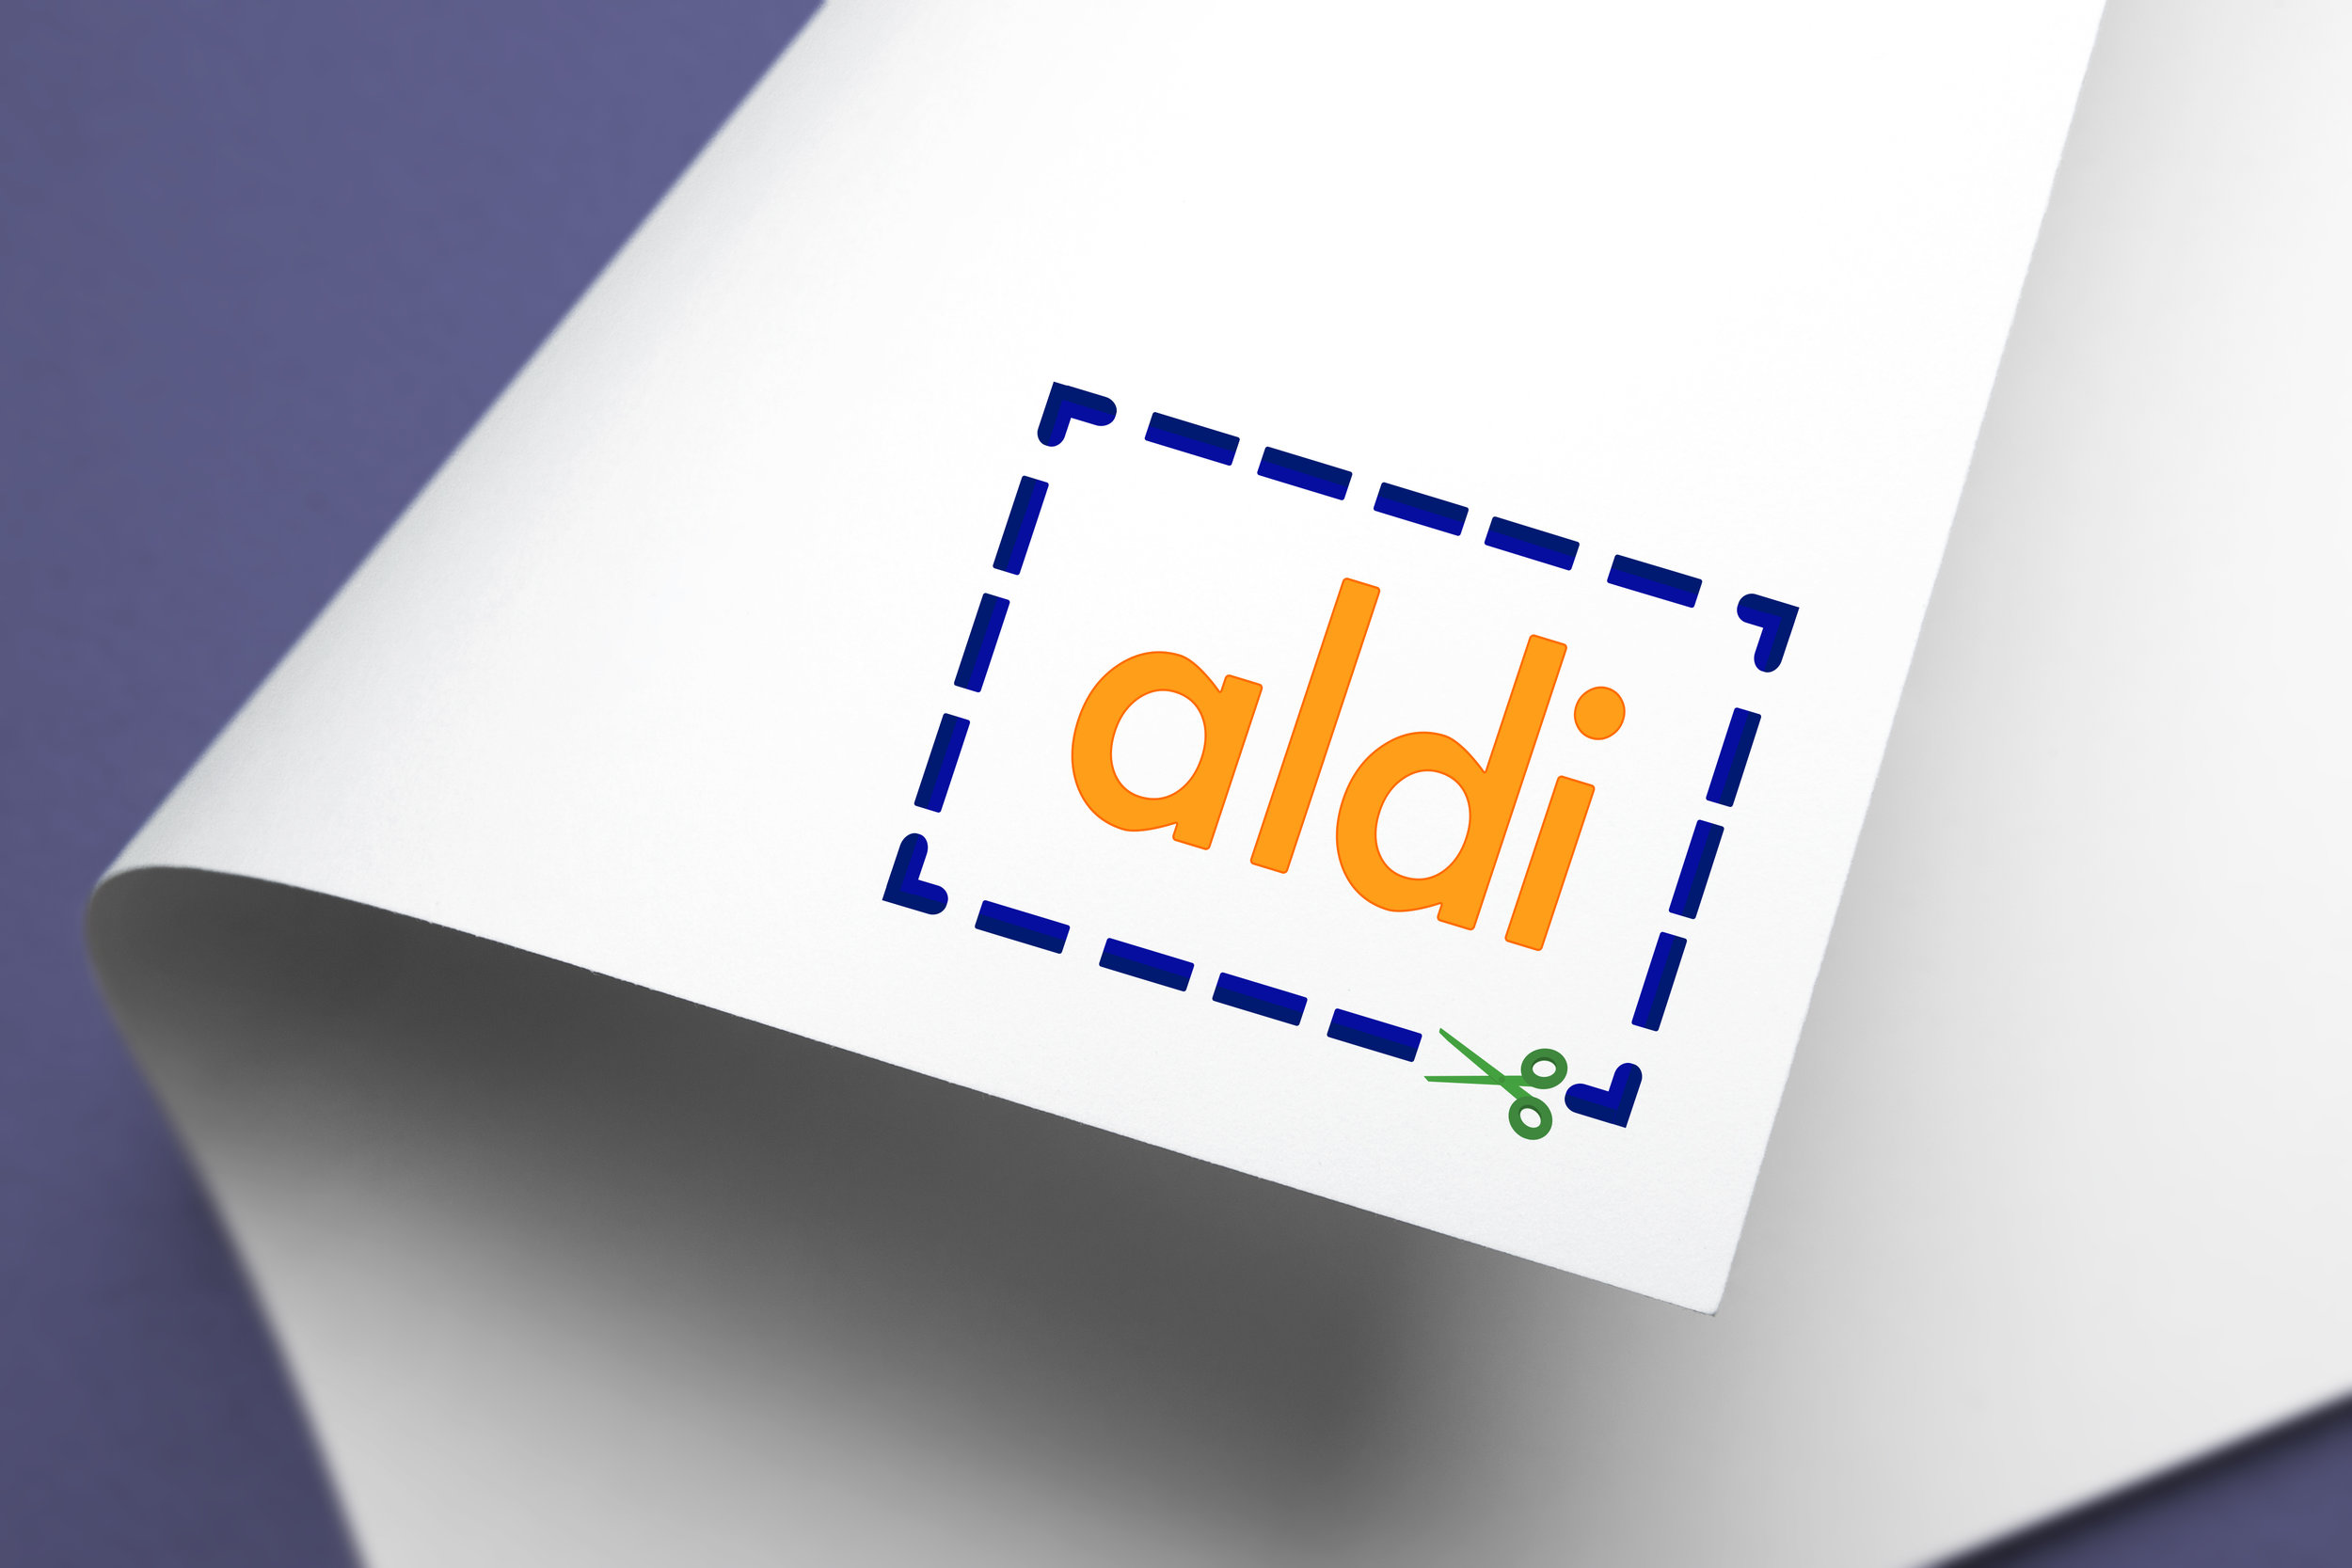 CDEPOT_ALDI_LOGO-1.jpg